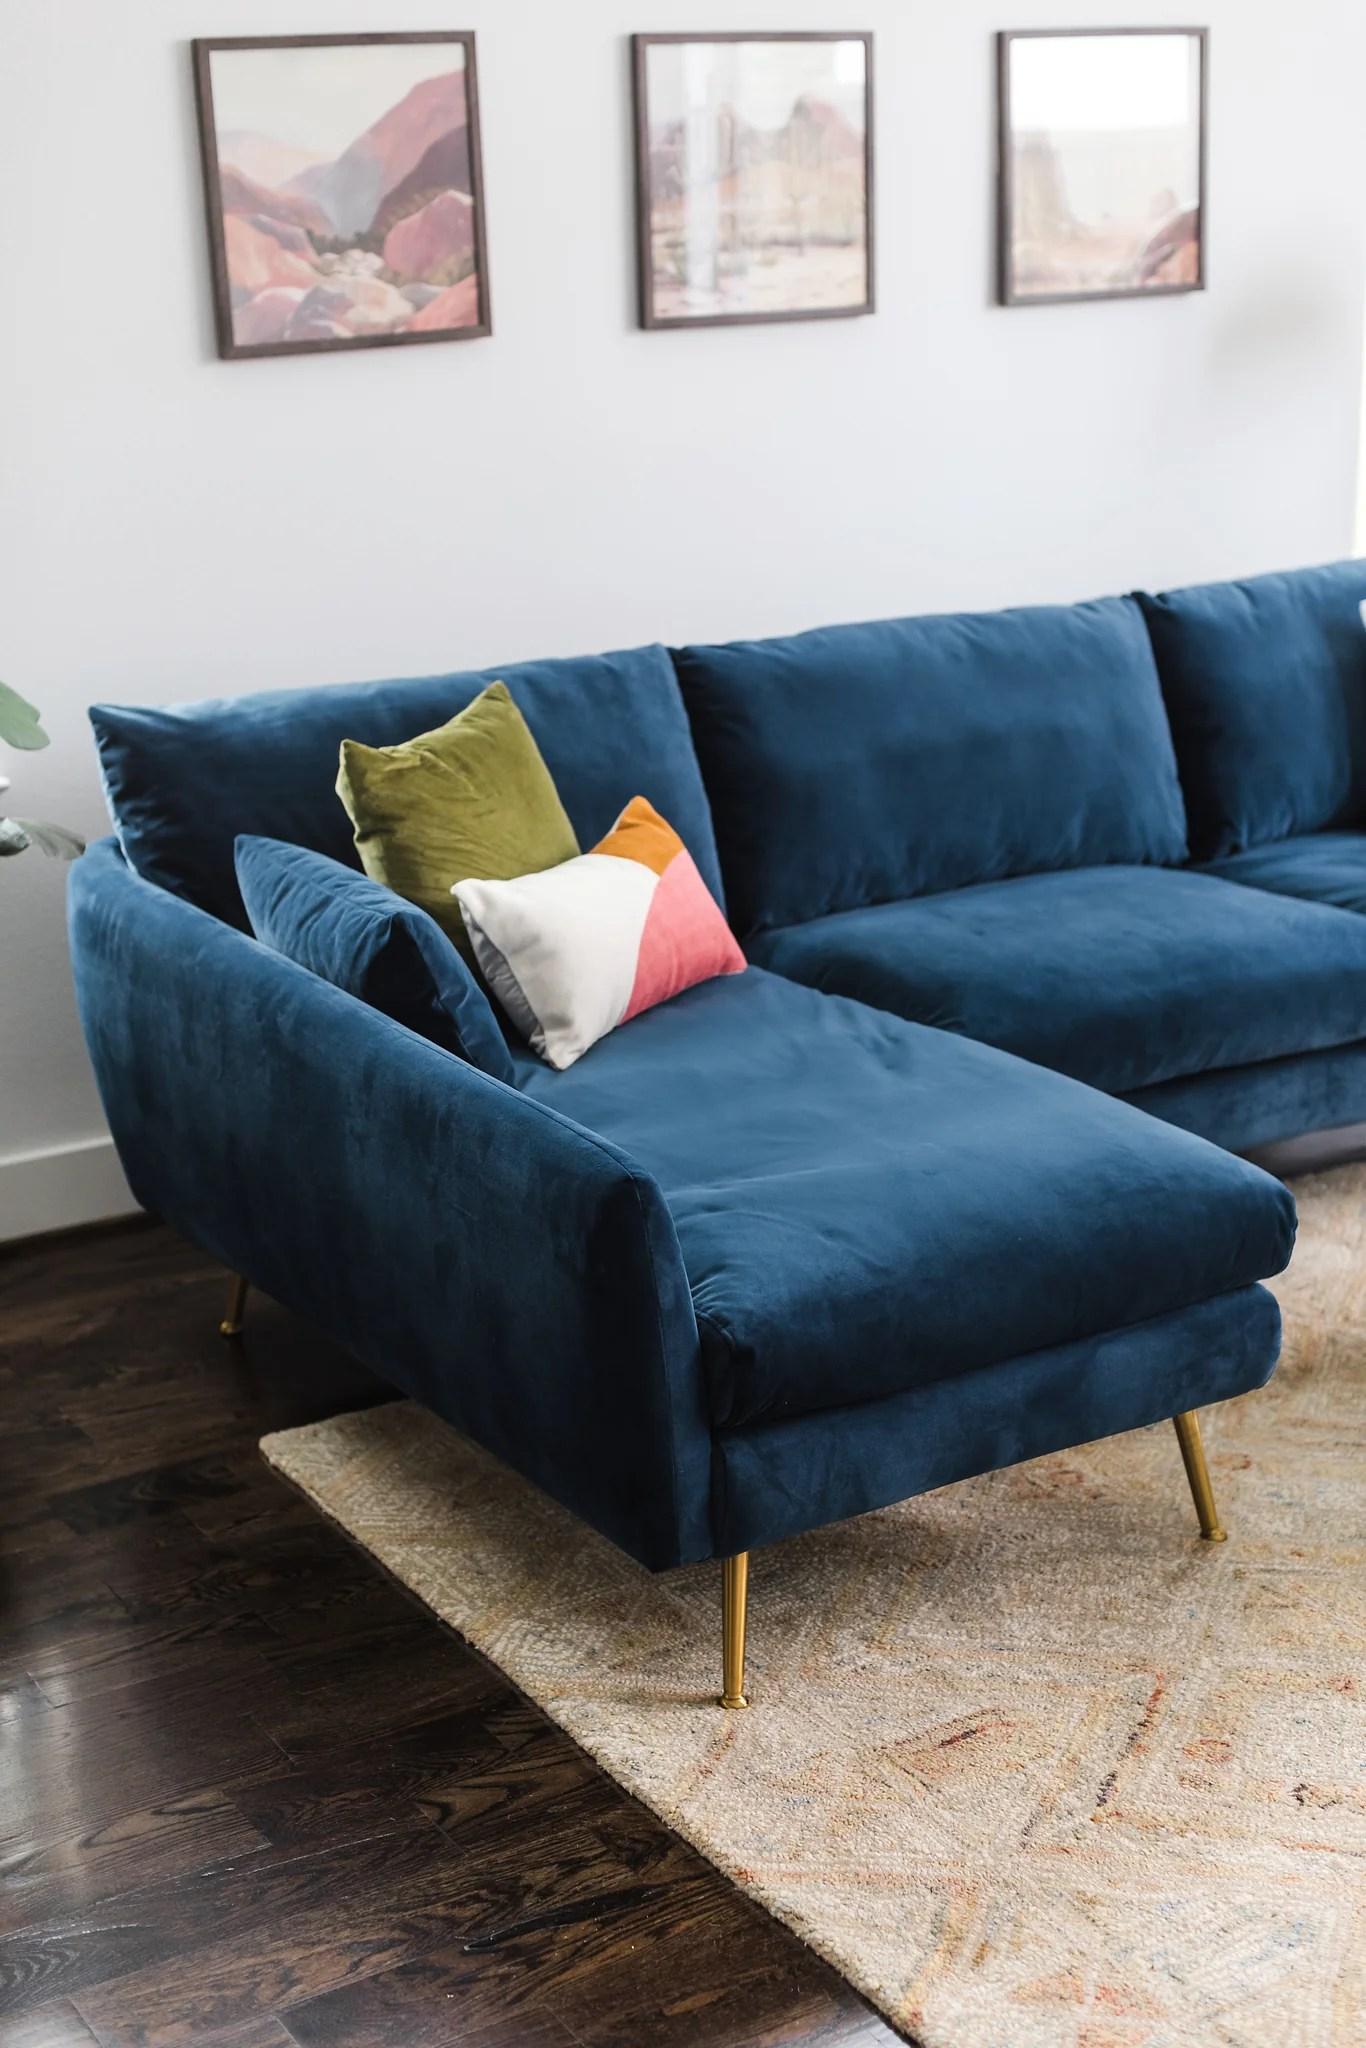 park sectional sofa